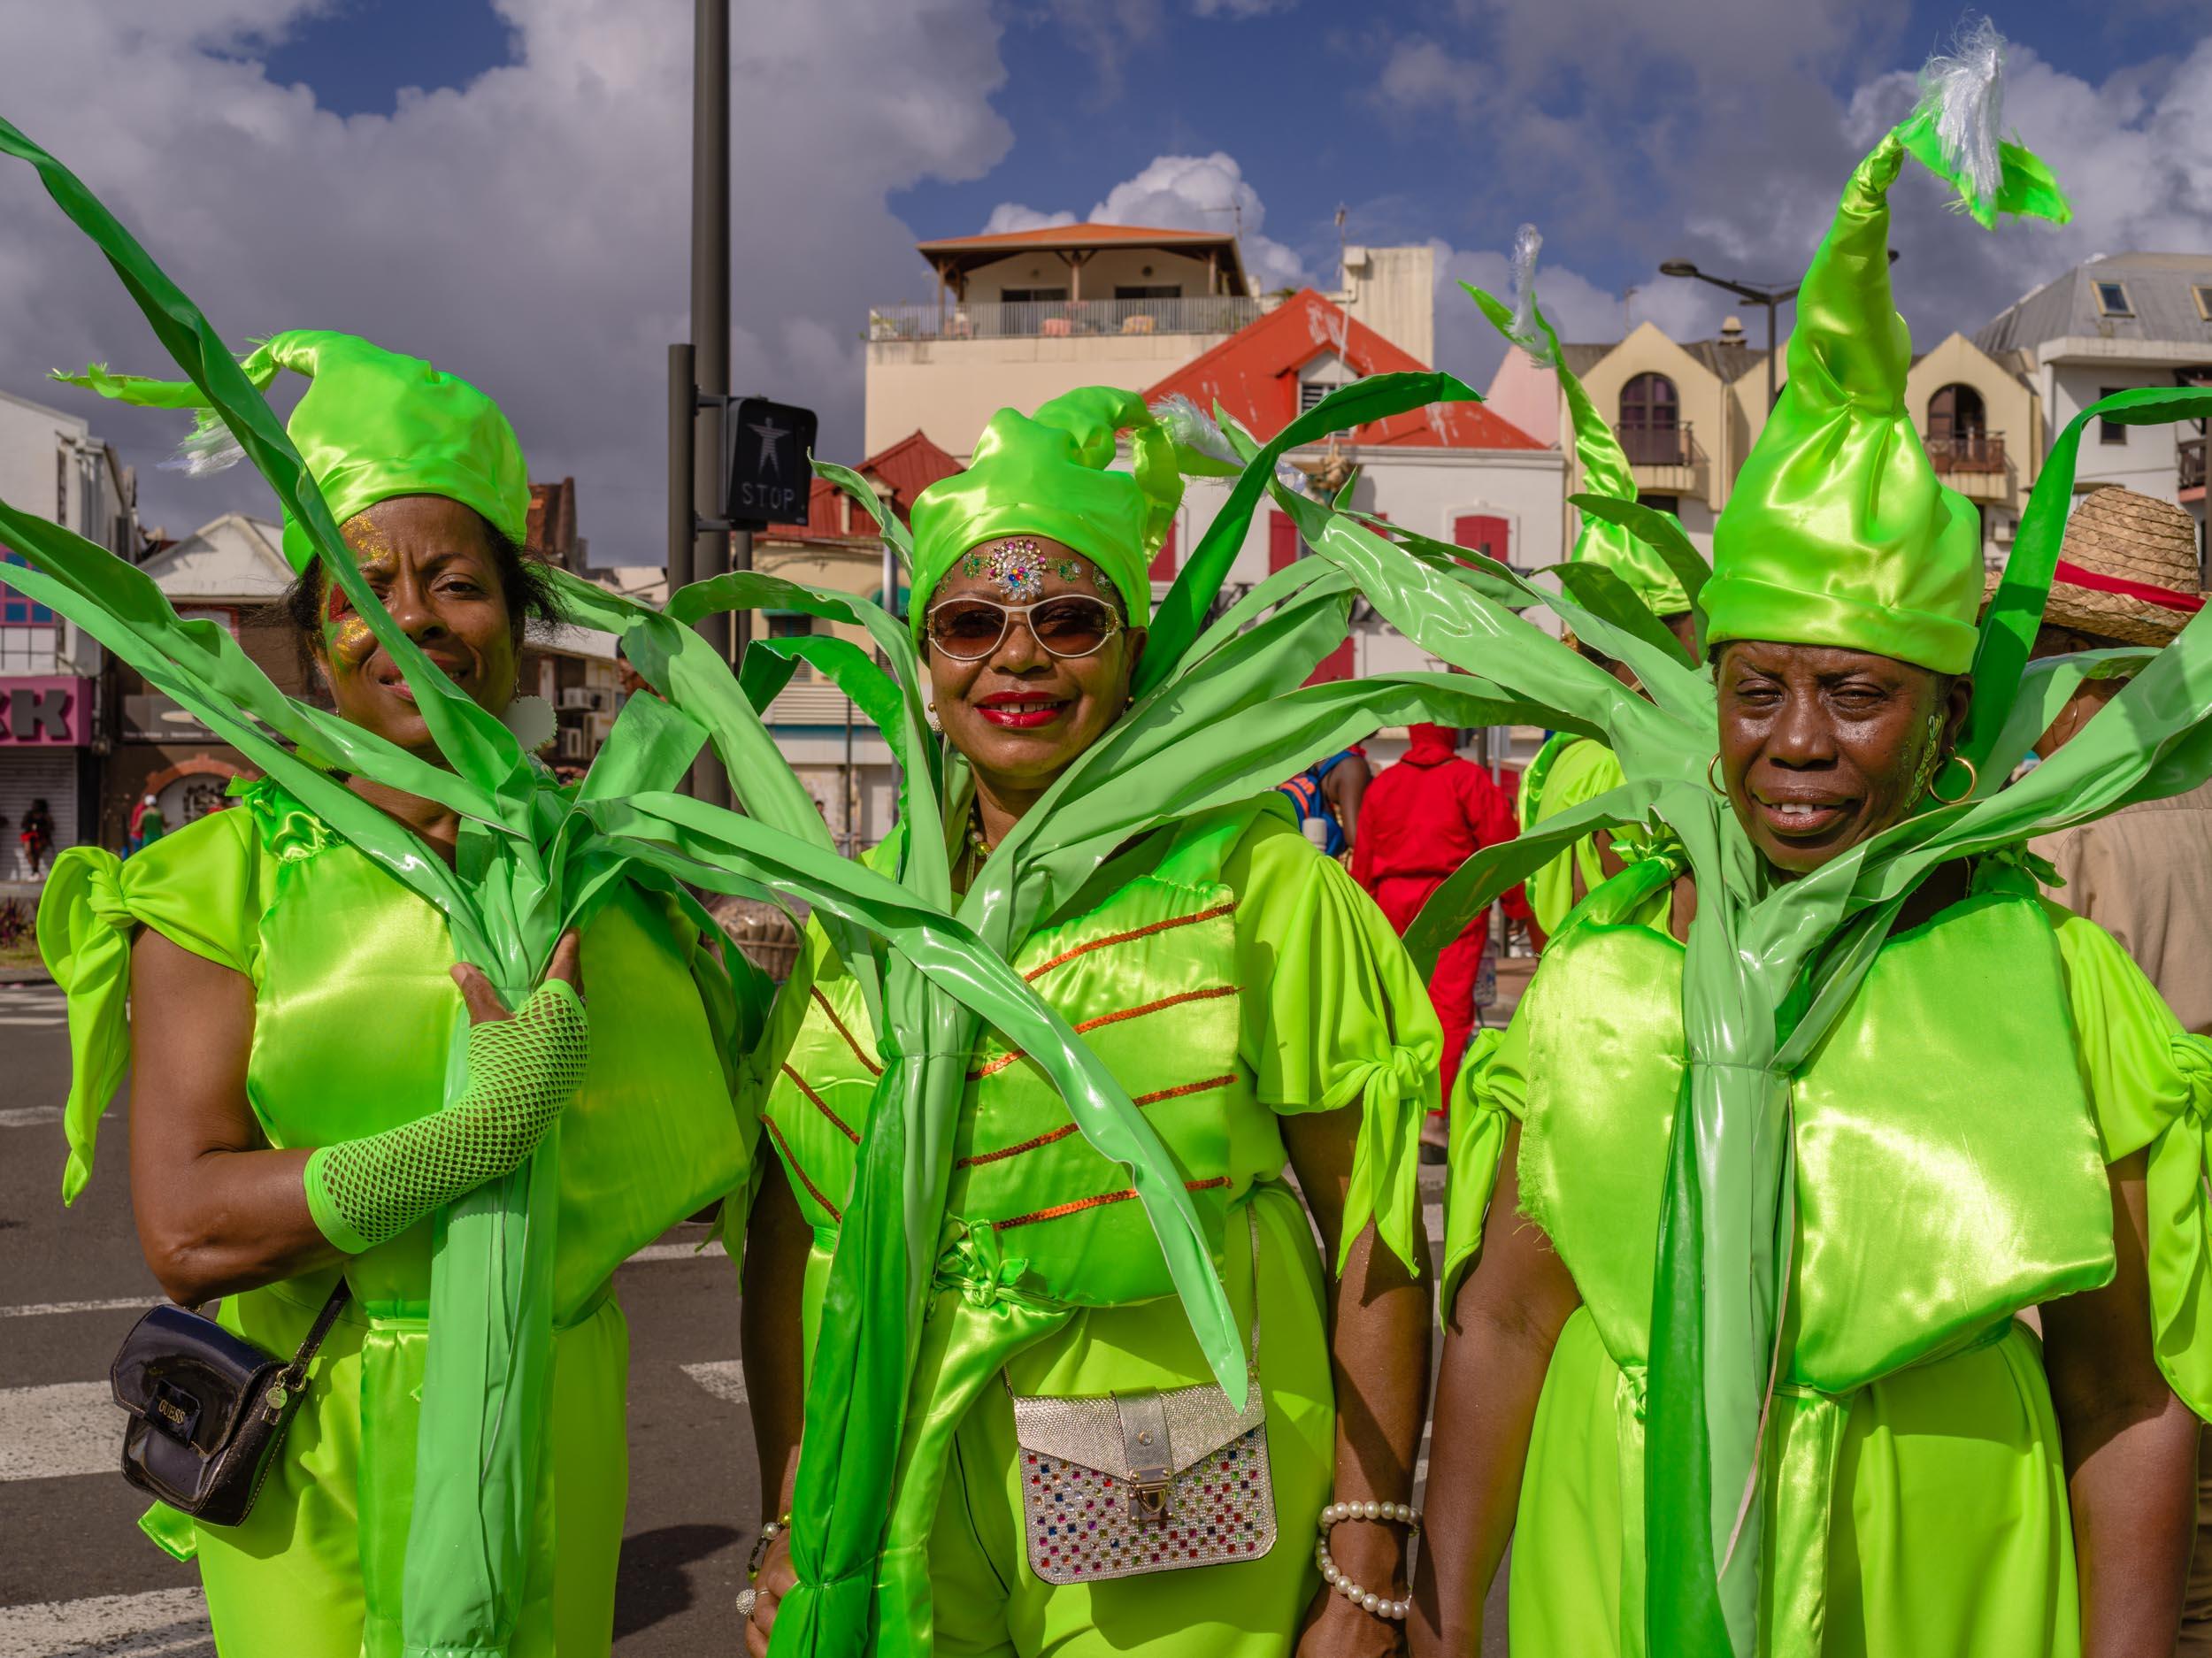 180213_SK_Martinique-24.jpg